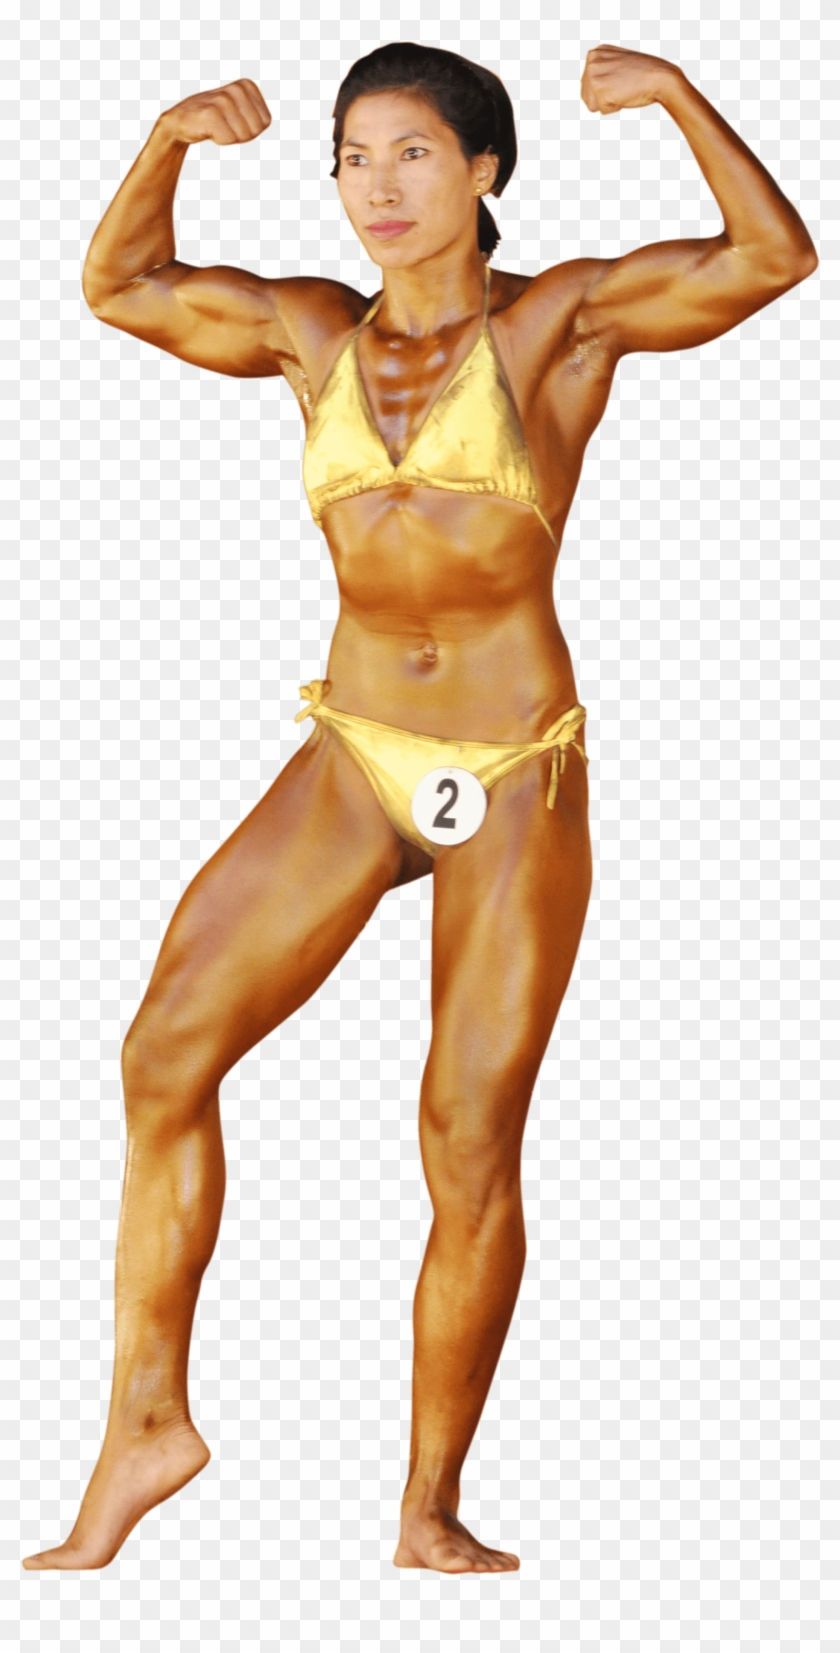 Physical Fitness Female Bodybuilding Bodybuilder Transparent Clipart 1341998 Pikpng